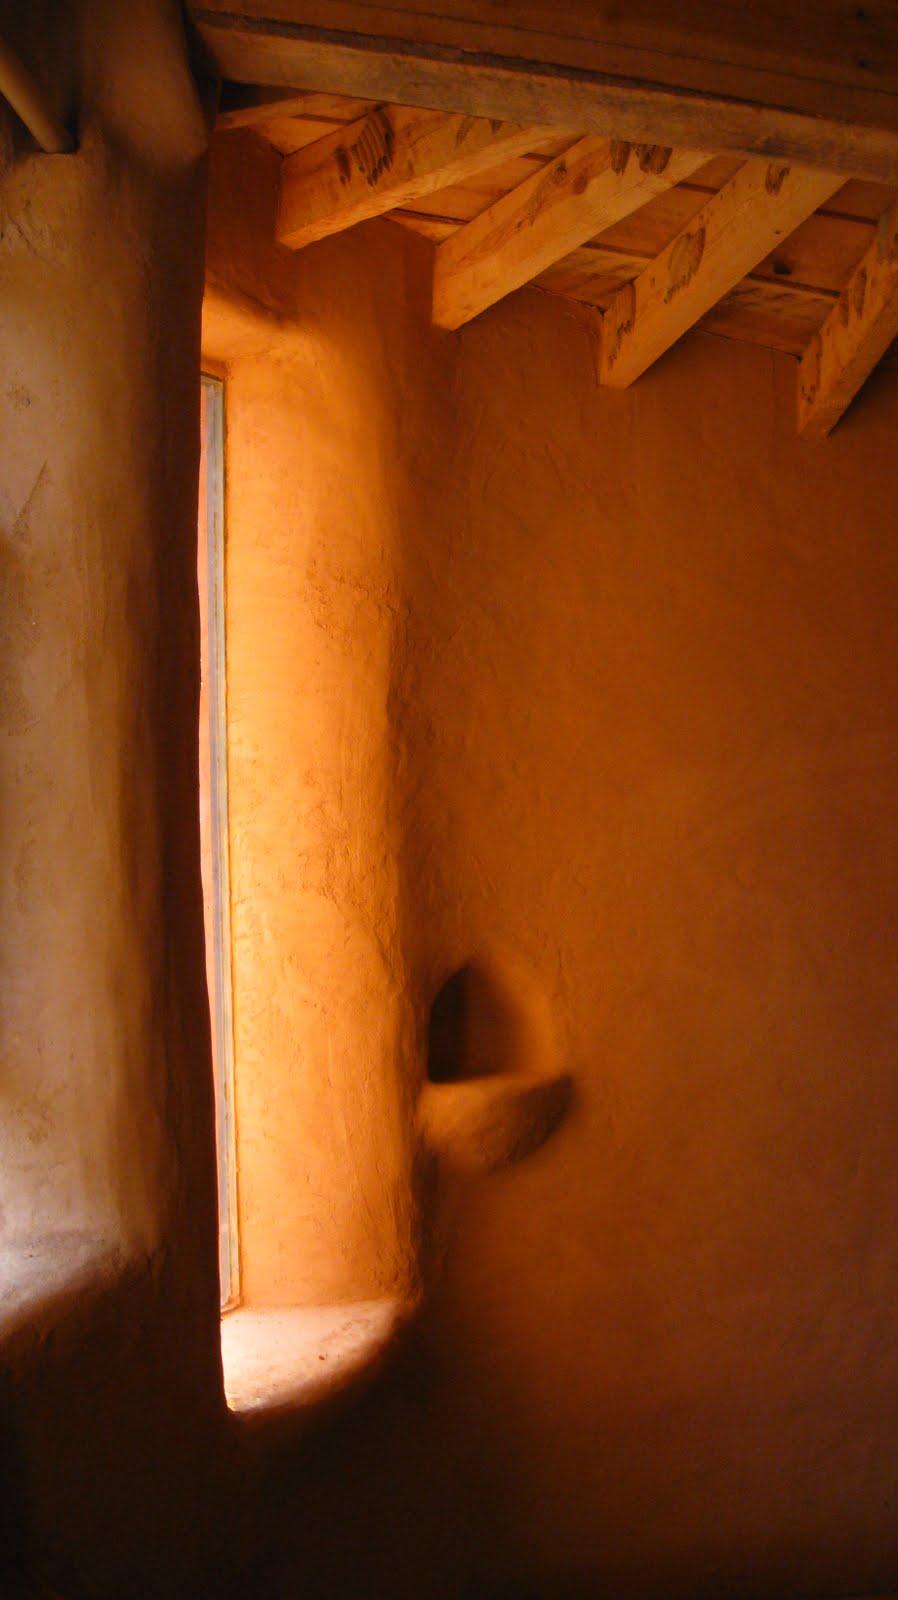 interior-quality-of-light.jpg